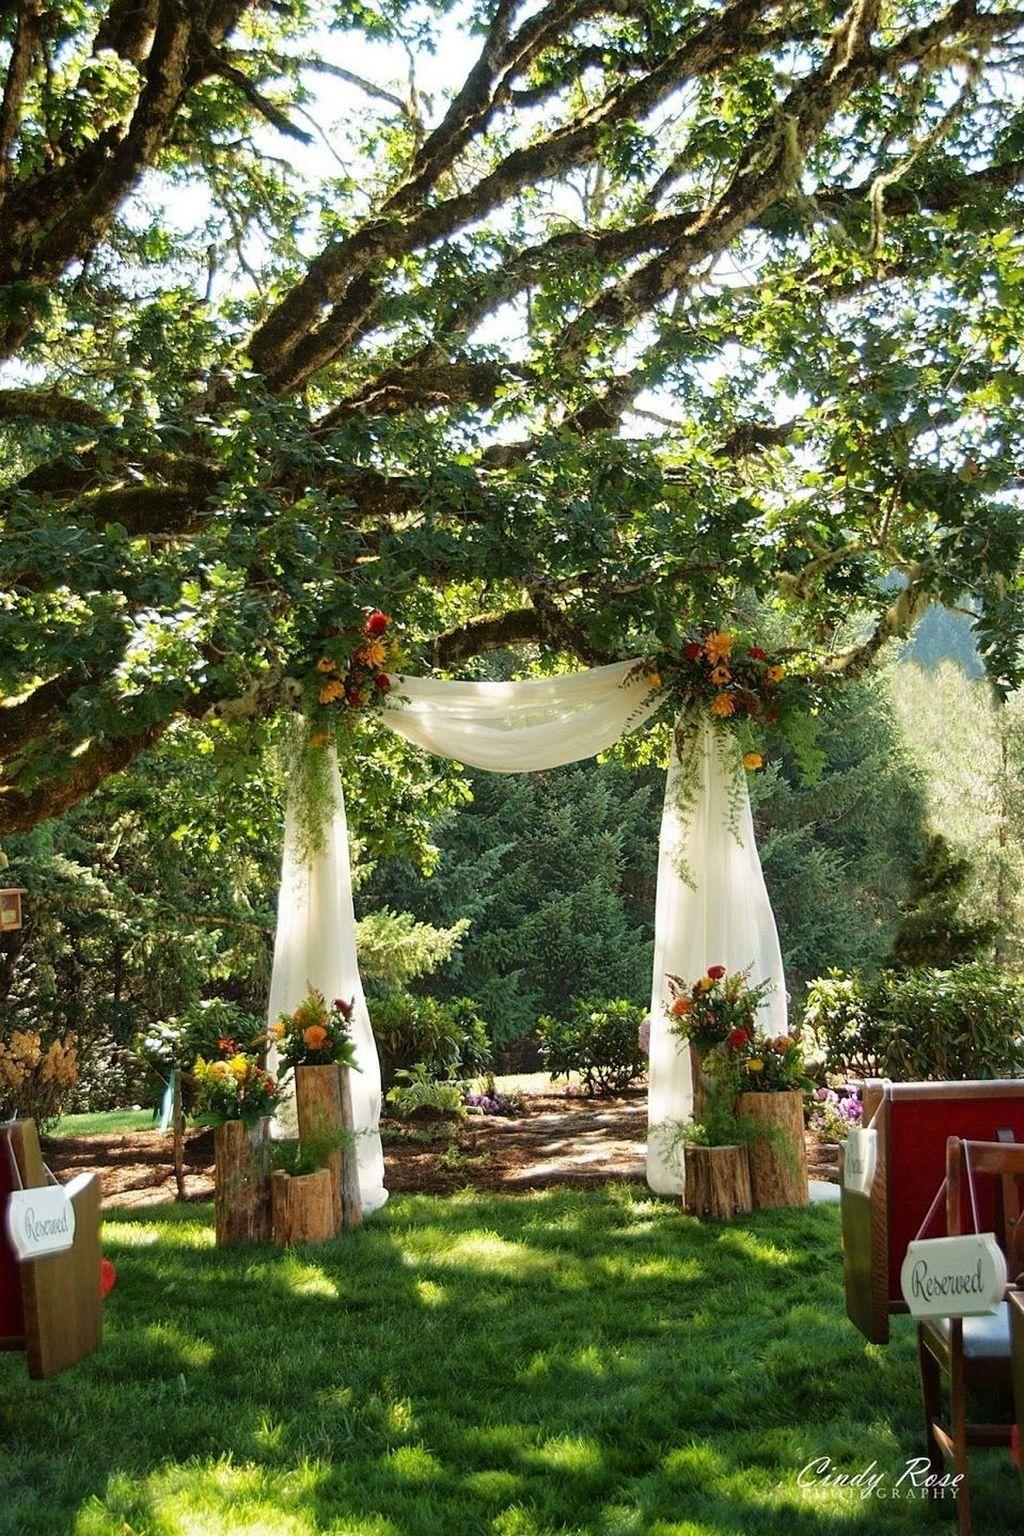 50 Beautiful Backyard Wedding Decor Ideas To Get A Romantic Impression - PIMPHOMEE #beautifulbackyards